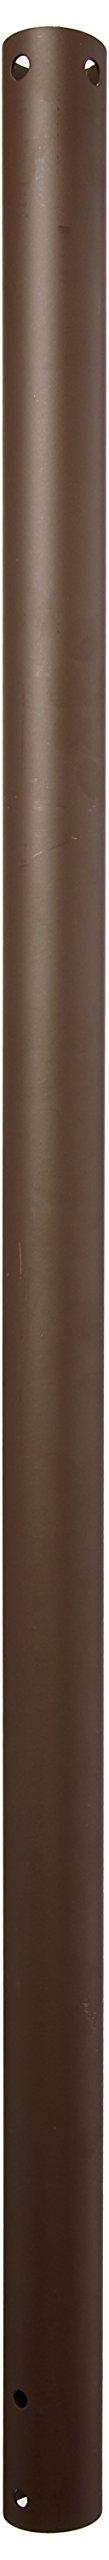 Fanimation EP48OB Extension Pole, 48-Inch, Oil-Rubbed Bronze